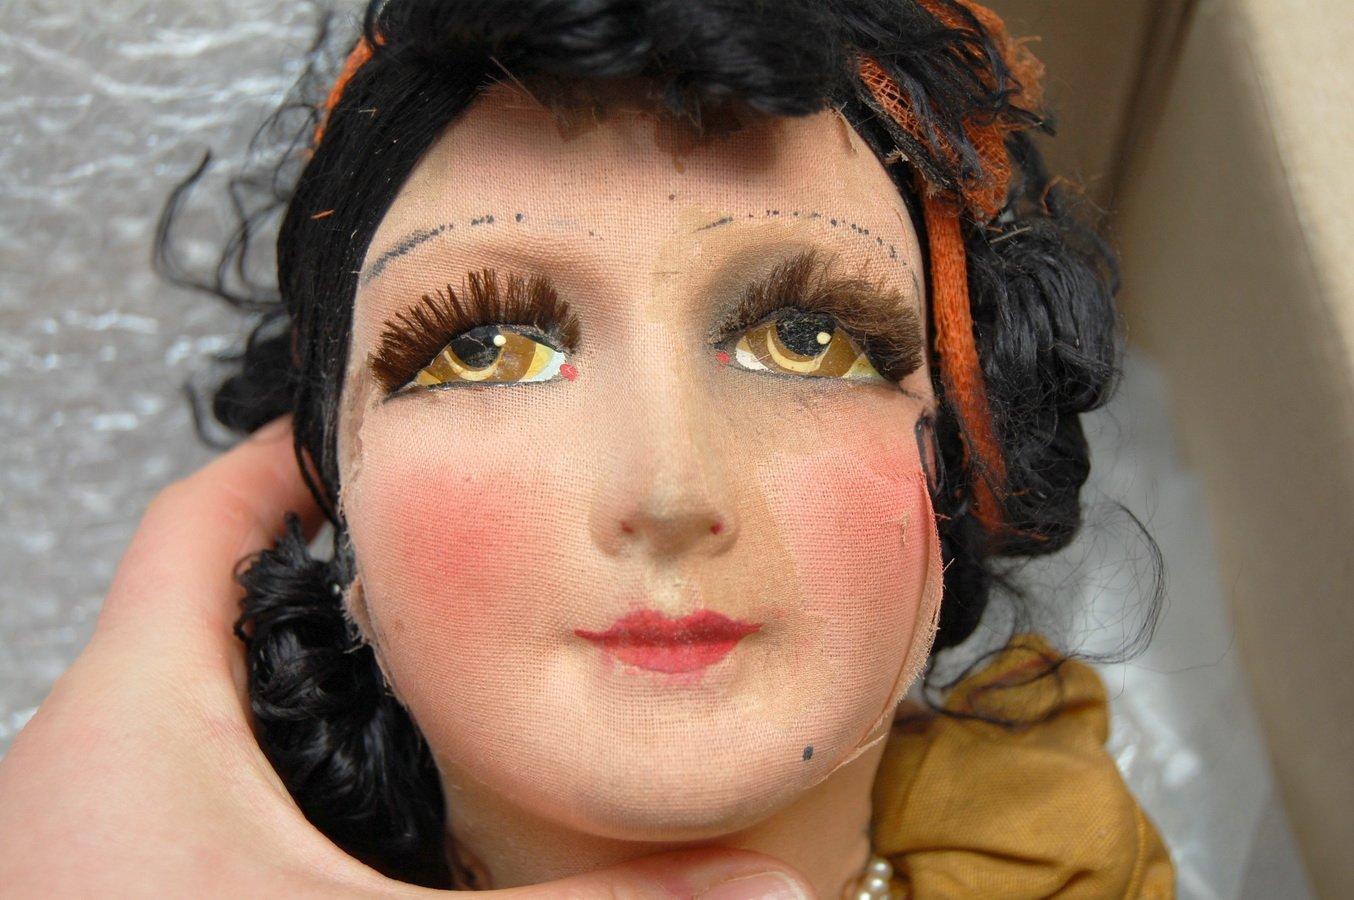 лицо антикварной будуарной куклы в процессе чистки